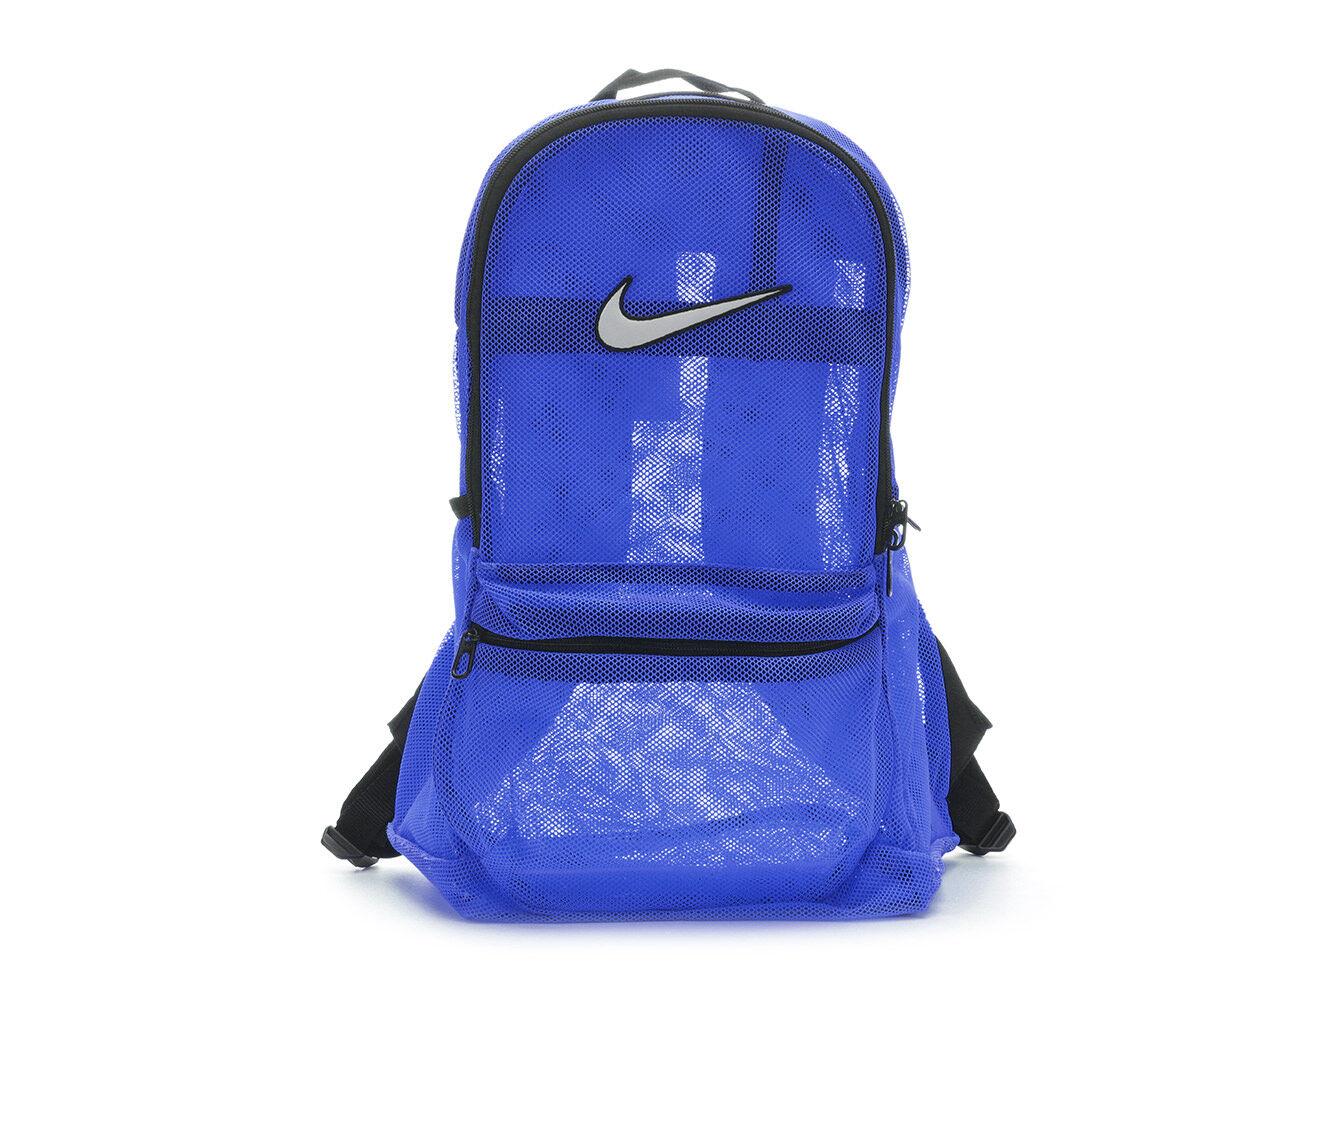 nike bags purple